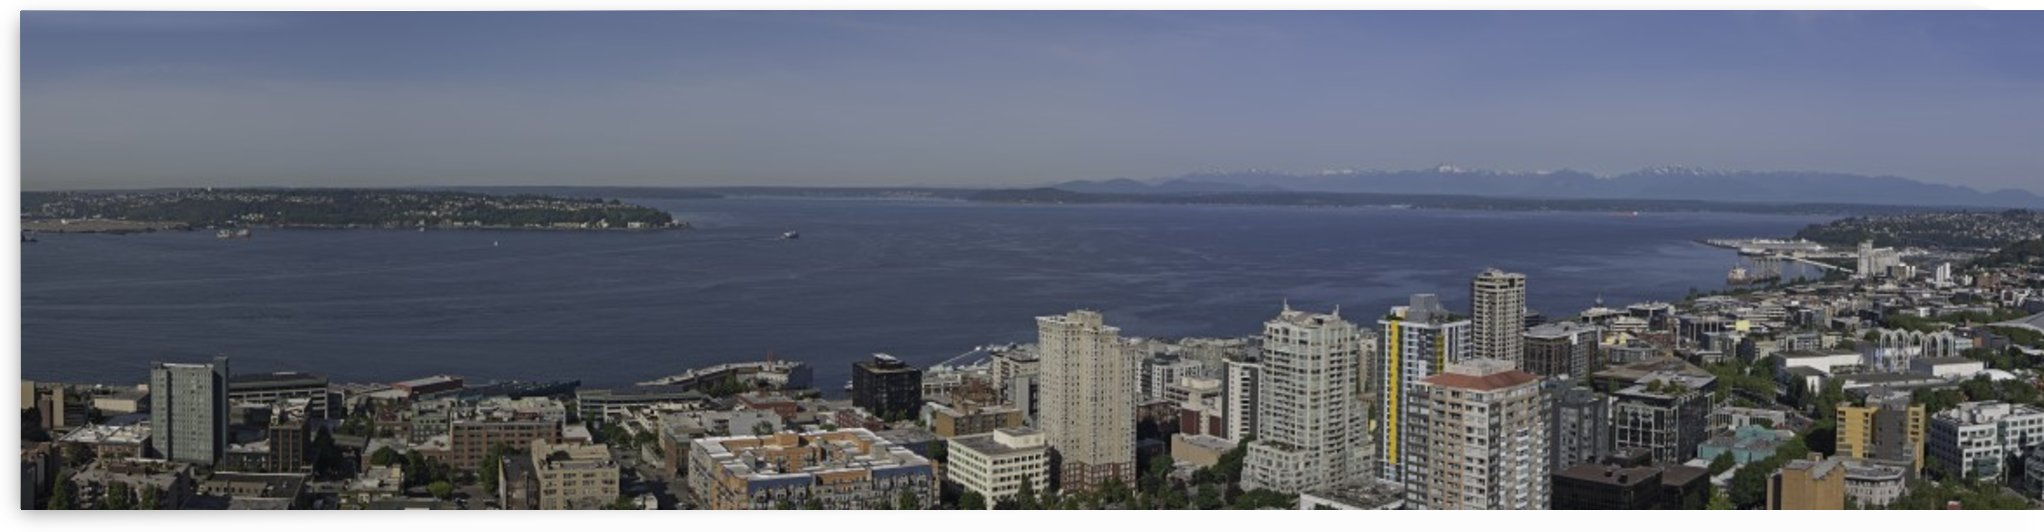 Westward Seattle Panoramic by Steve